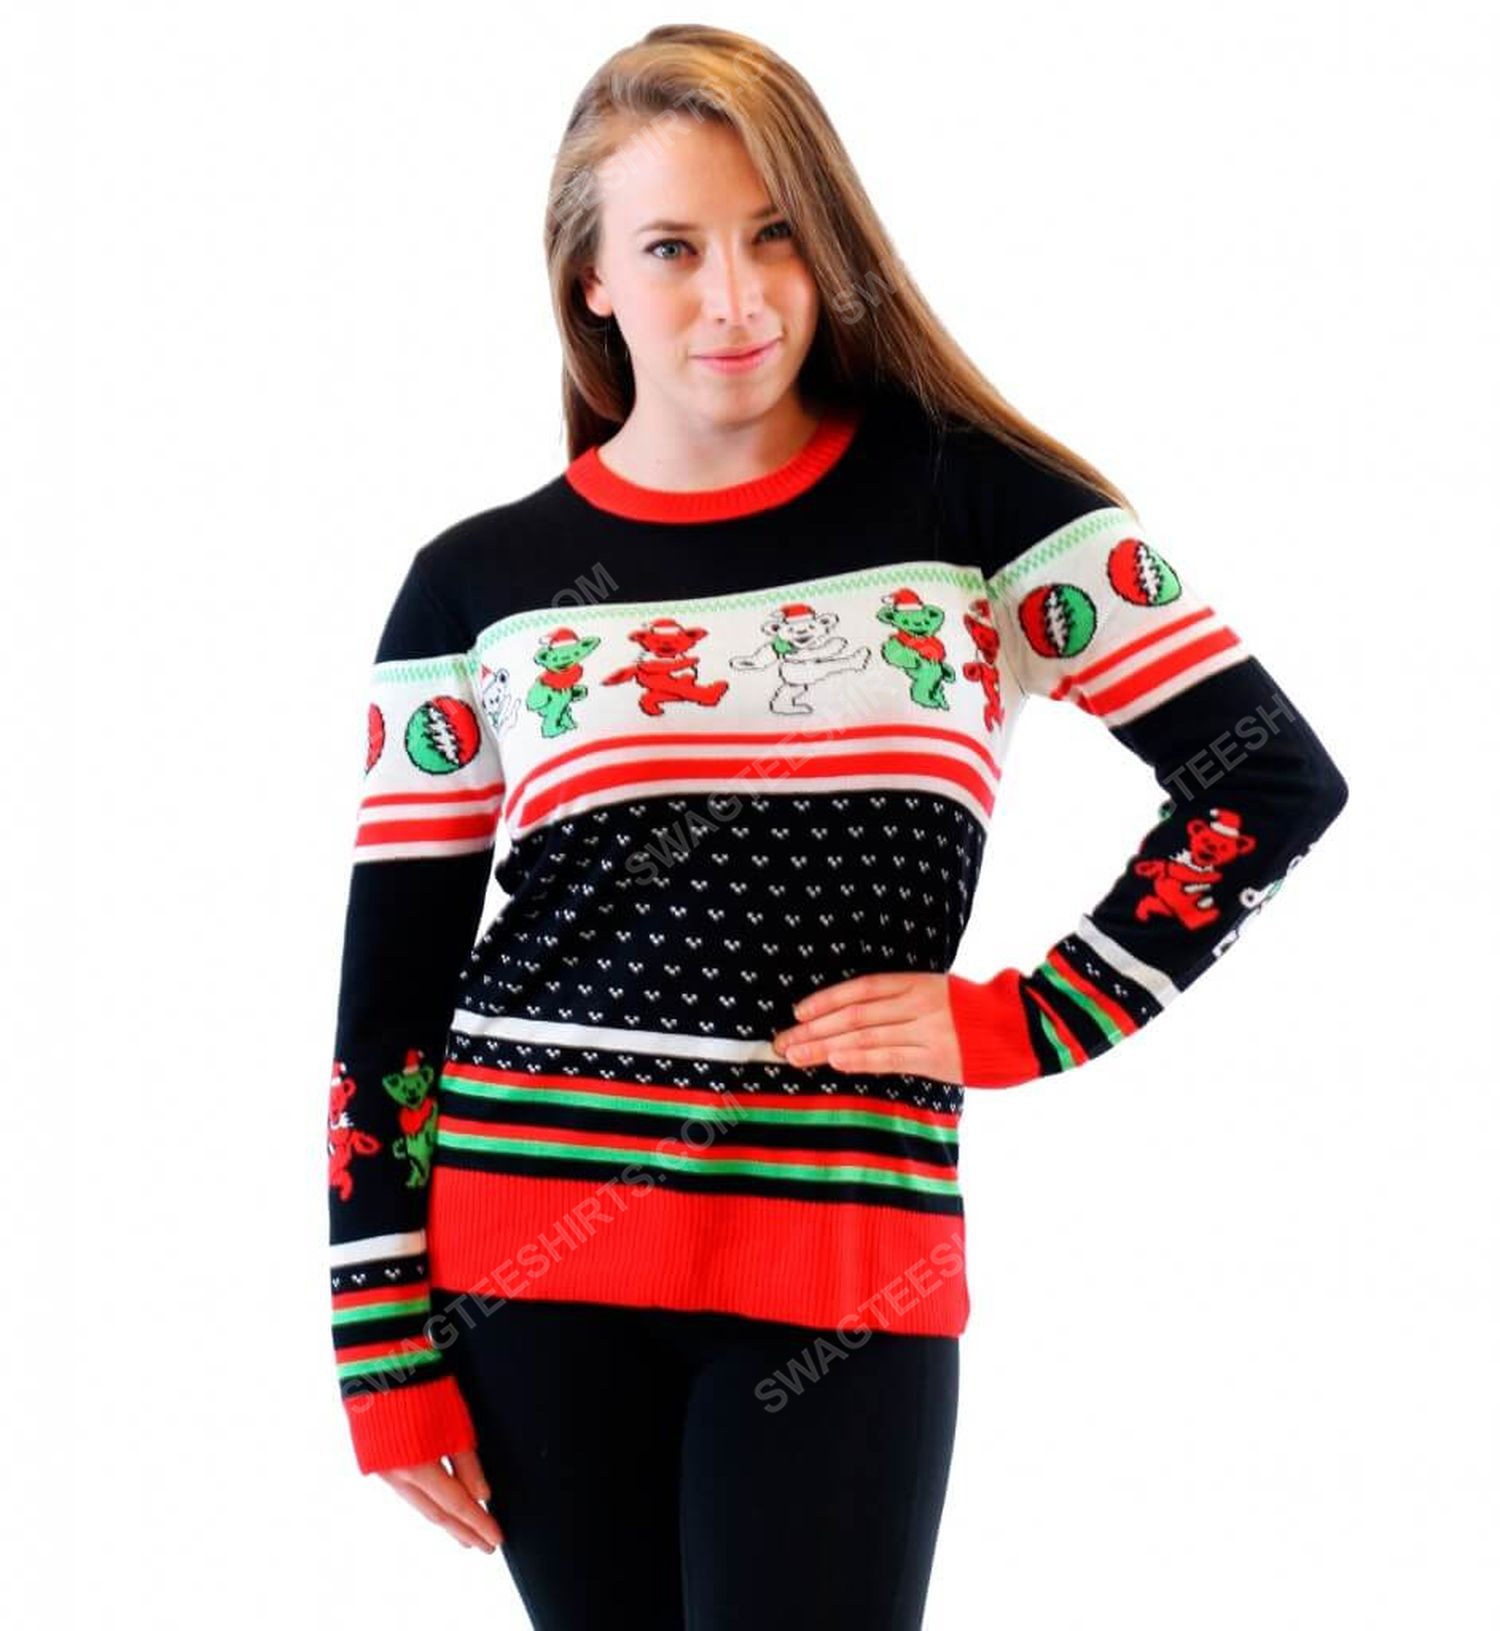 Grateful dead dancing bears full print ugly christmas sweater 2 - Copy